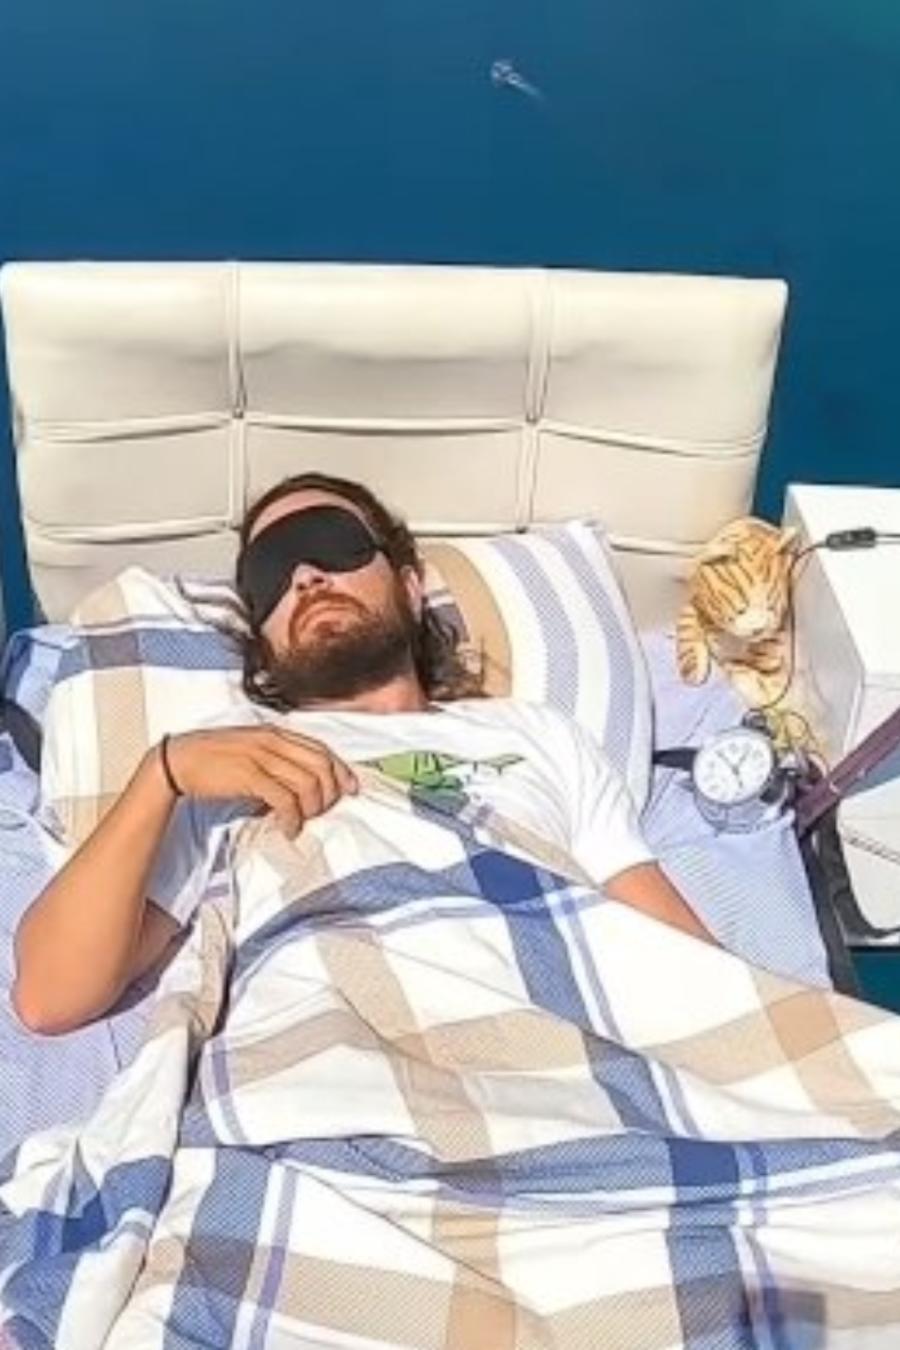 Paracaidista con cama